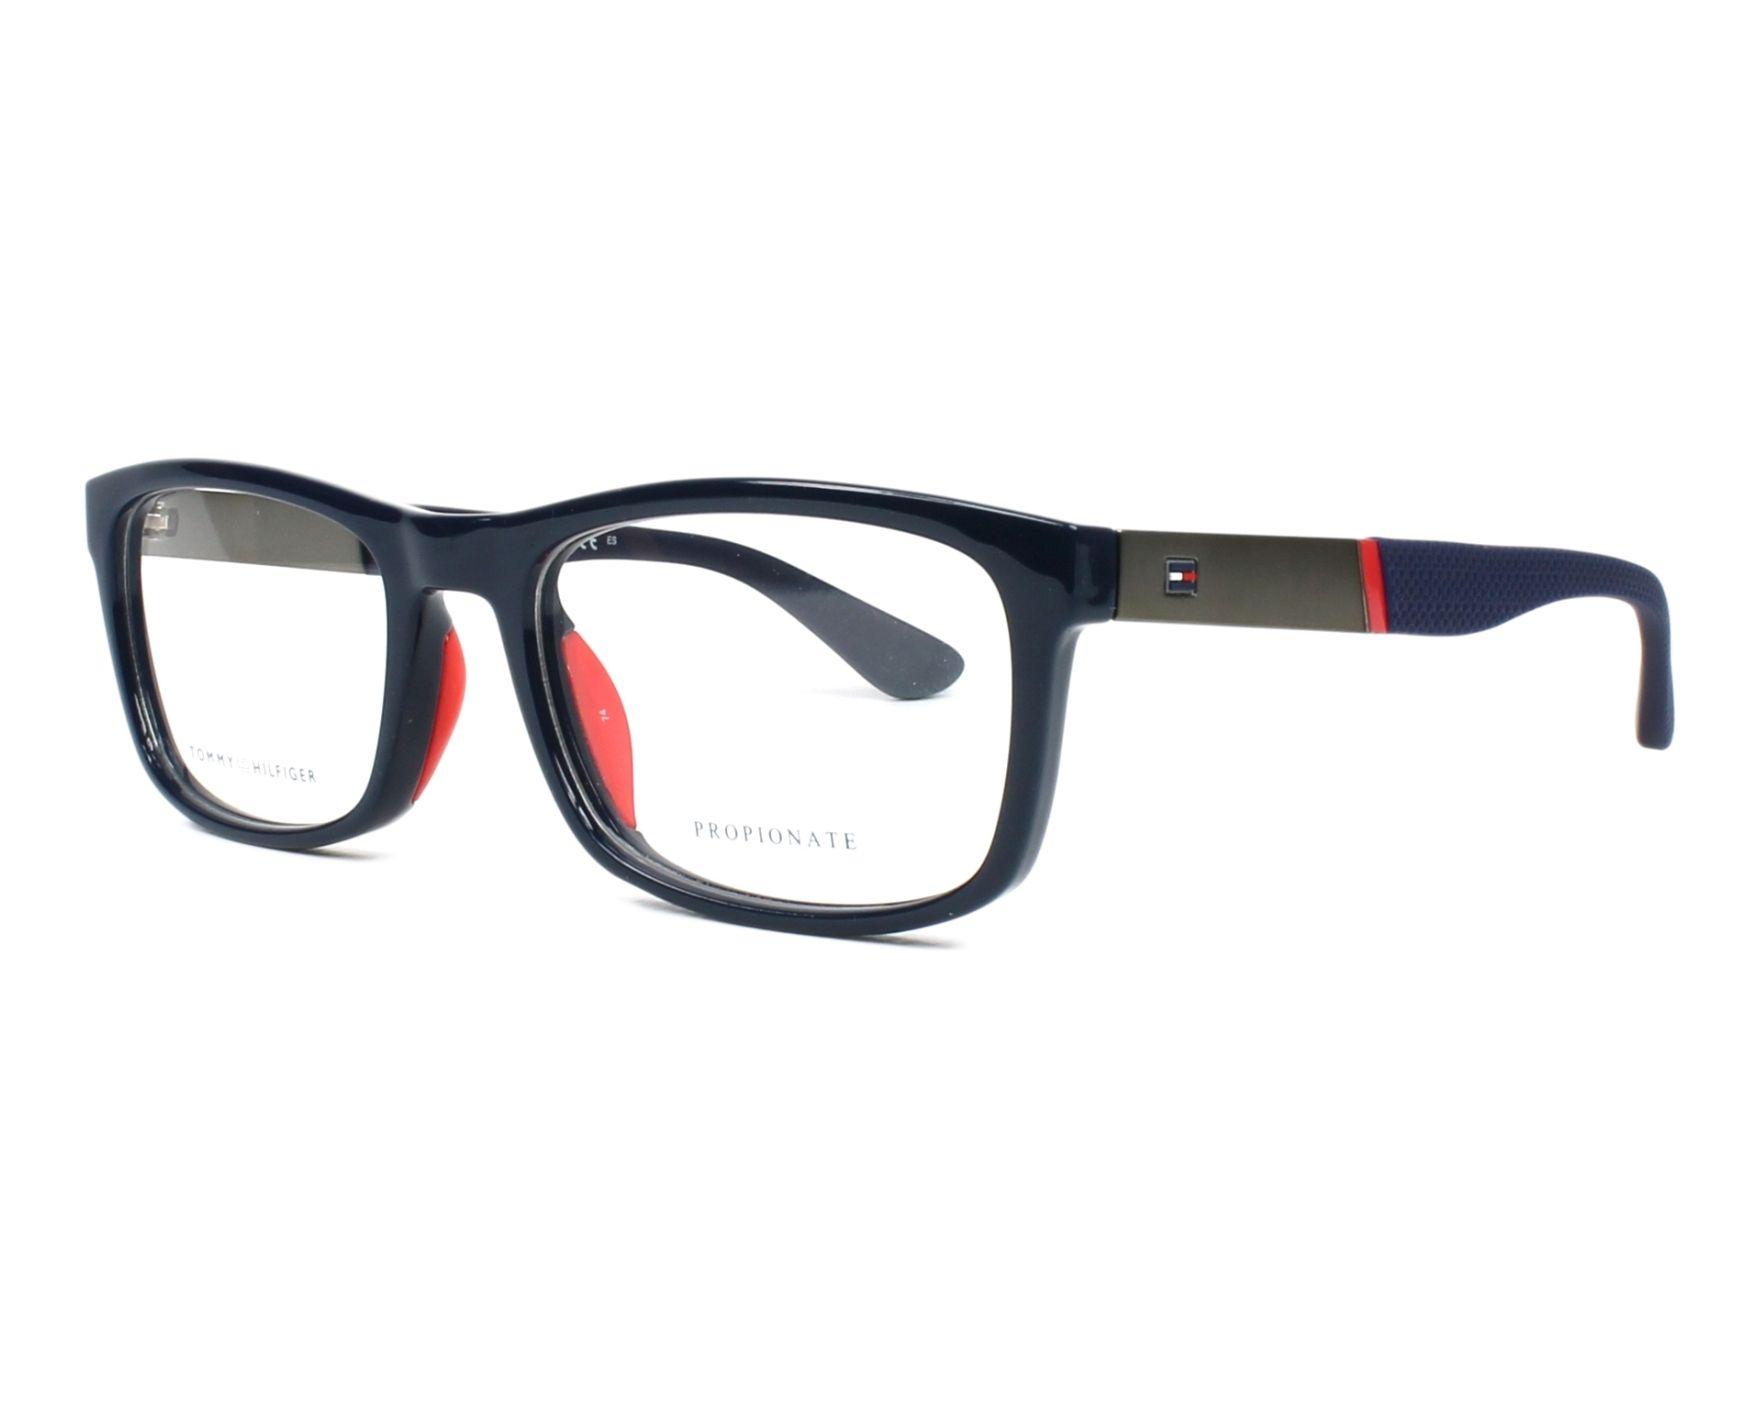 8e8c8b9212 Get Free Shipping on Tommy Hilfiger Eyeglasses TH 1522 ...